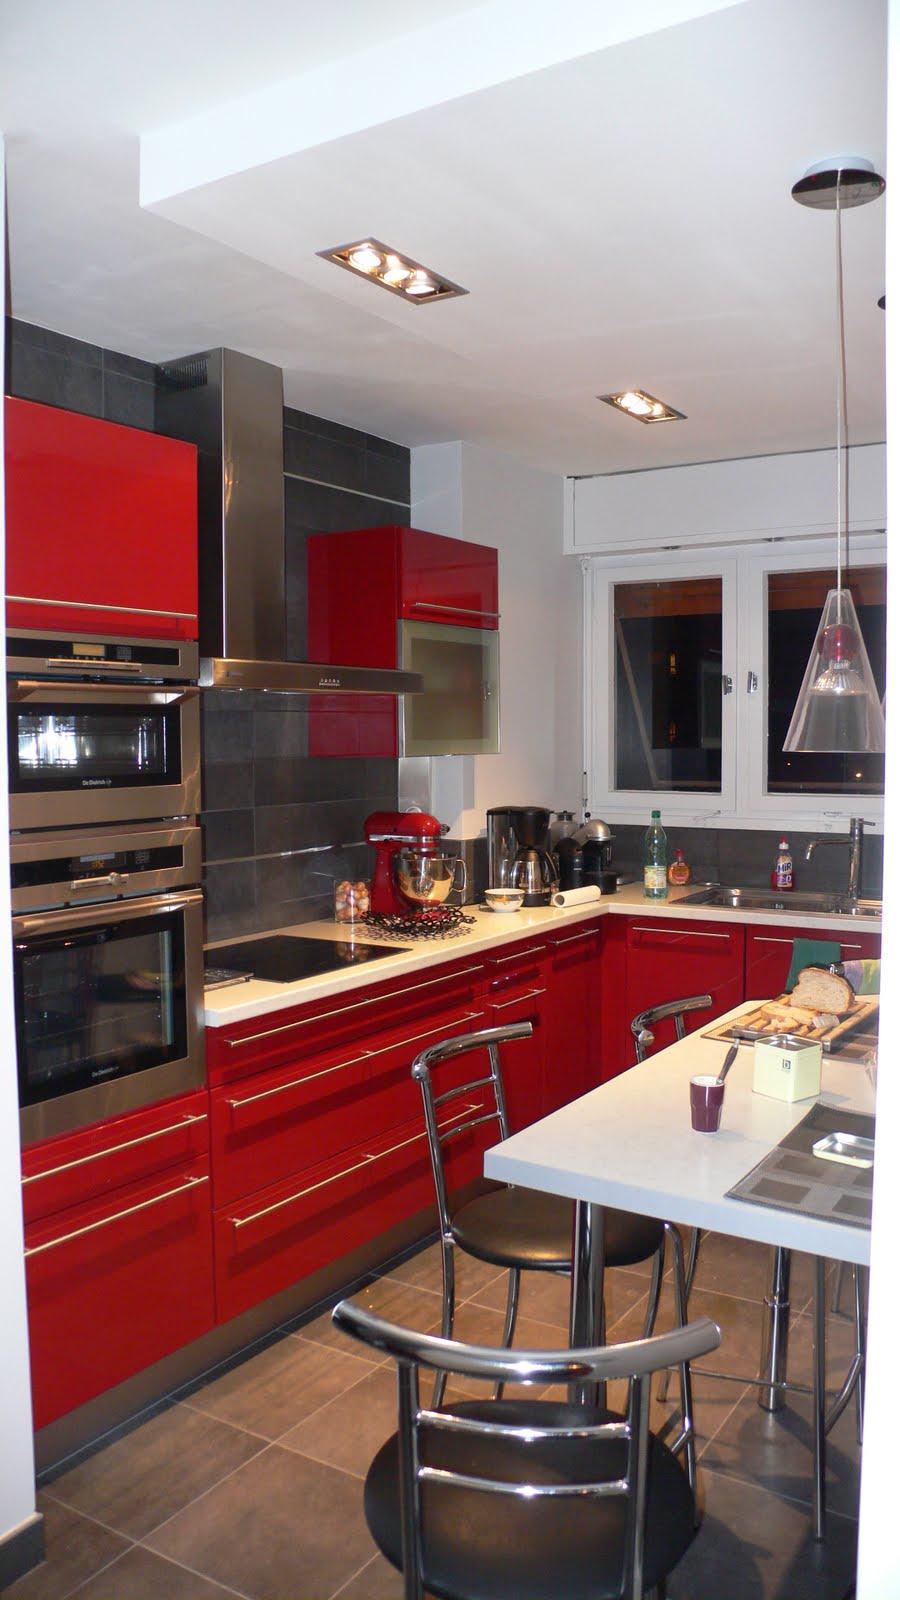 Miltech cuisines for Cuisine incorporee rouge